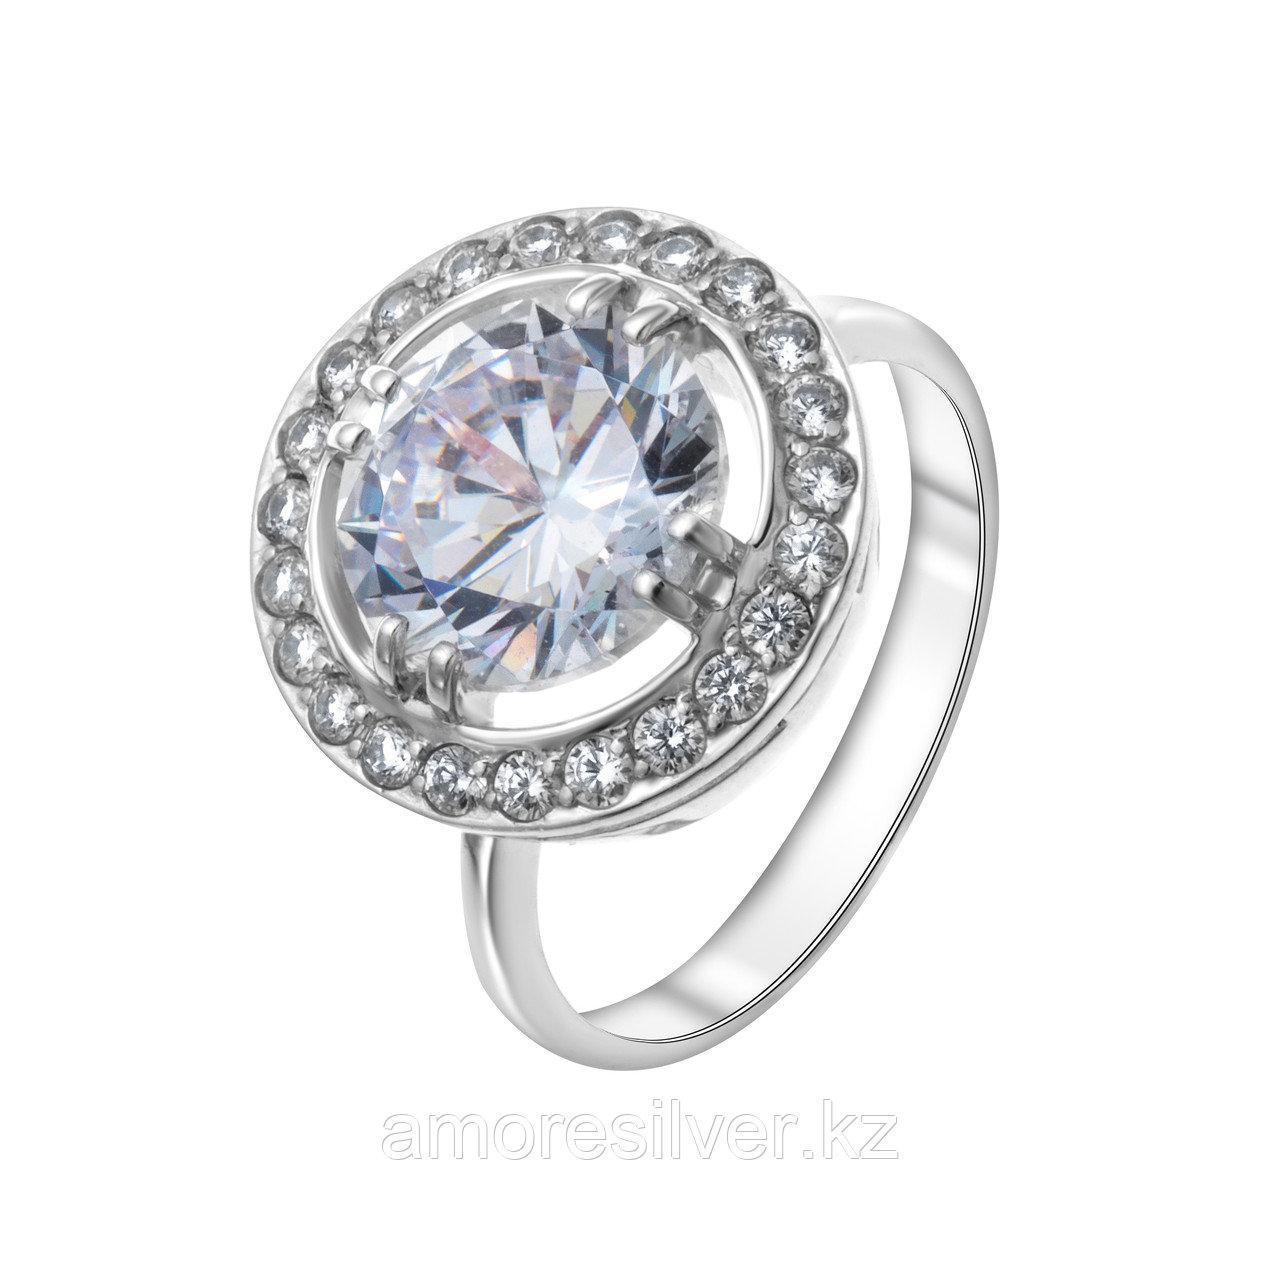 "Кольцо Teosa серебро с родием, фианит, , ""halo"" 100-031"